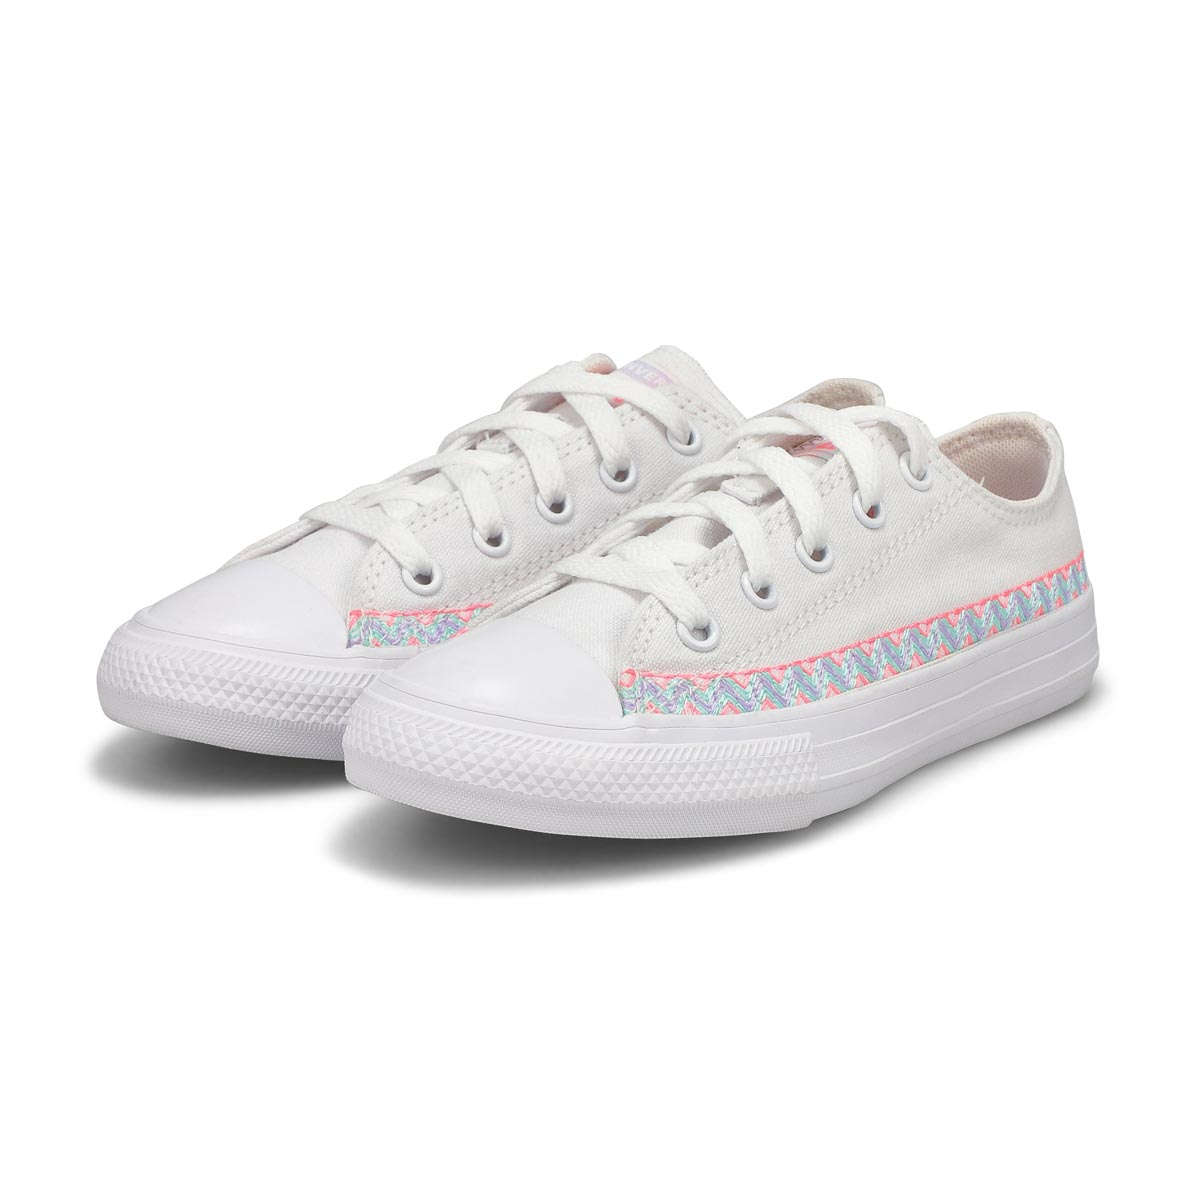 Girls' Chuck Taylor All Star Sneaker - White Multi